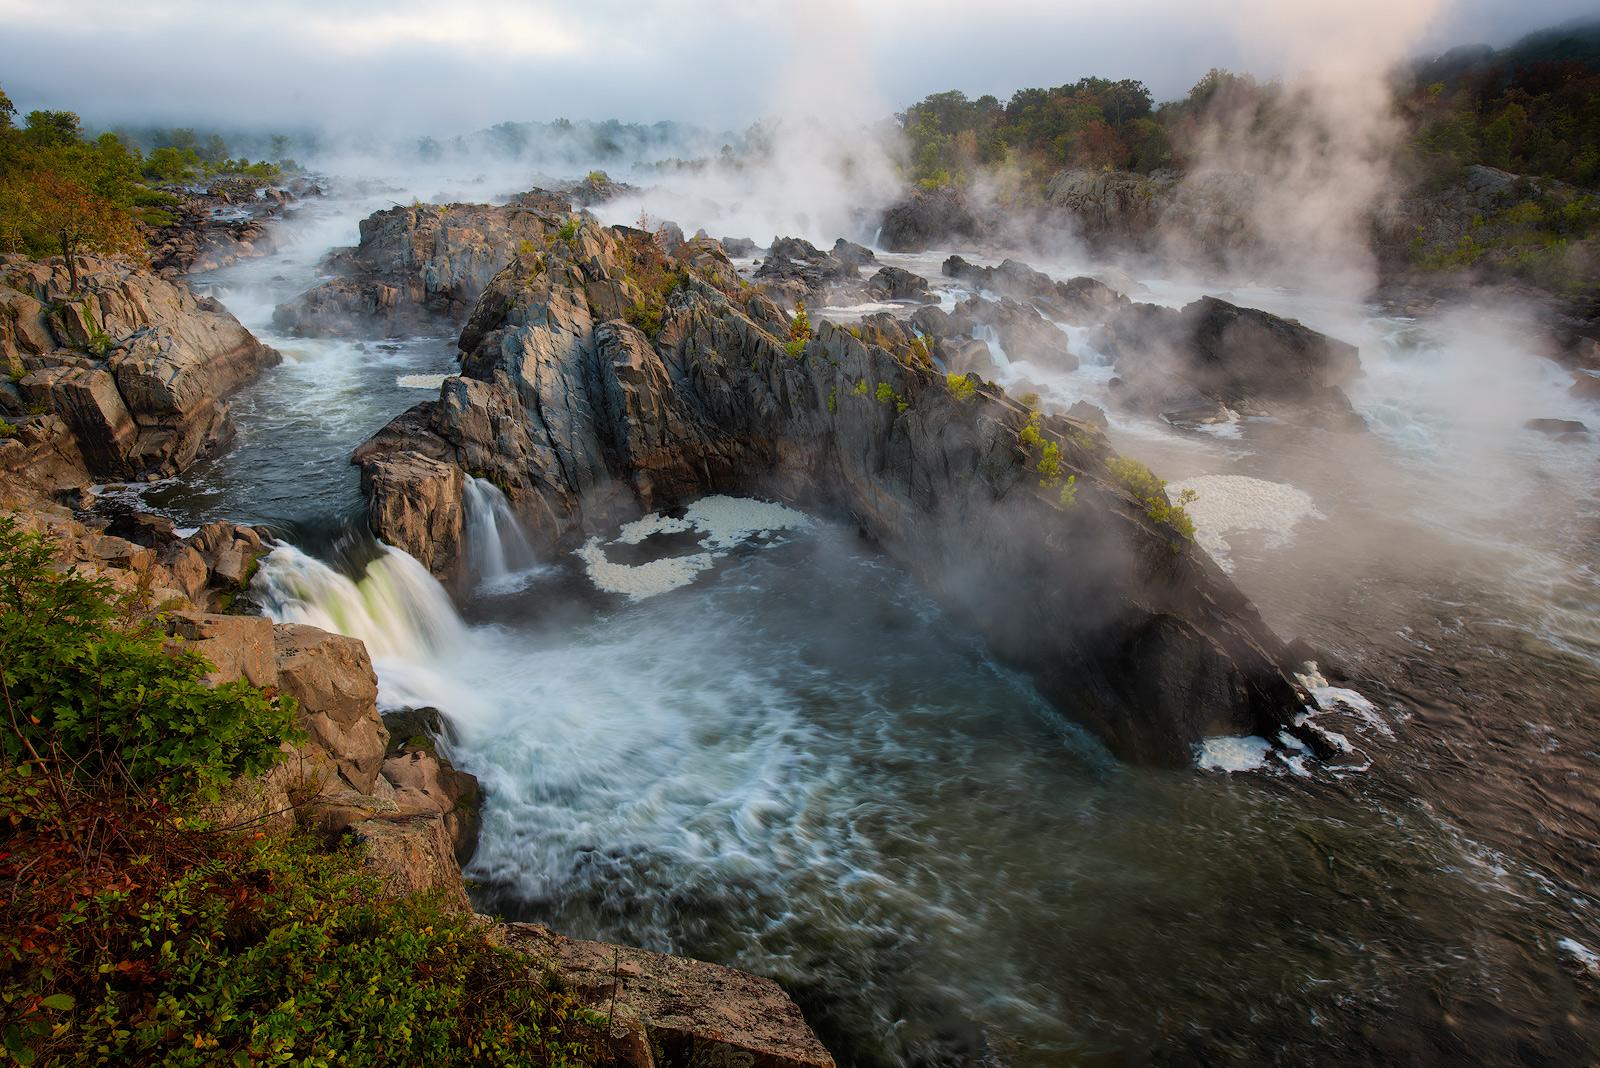 Great Falls Park, Potomac River, Virginia, Maryland, Great Falls, River, National Park Service, Mather Gorge, water, waterfalls...